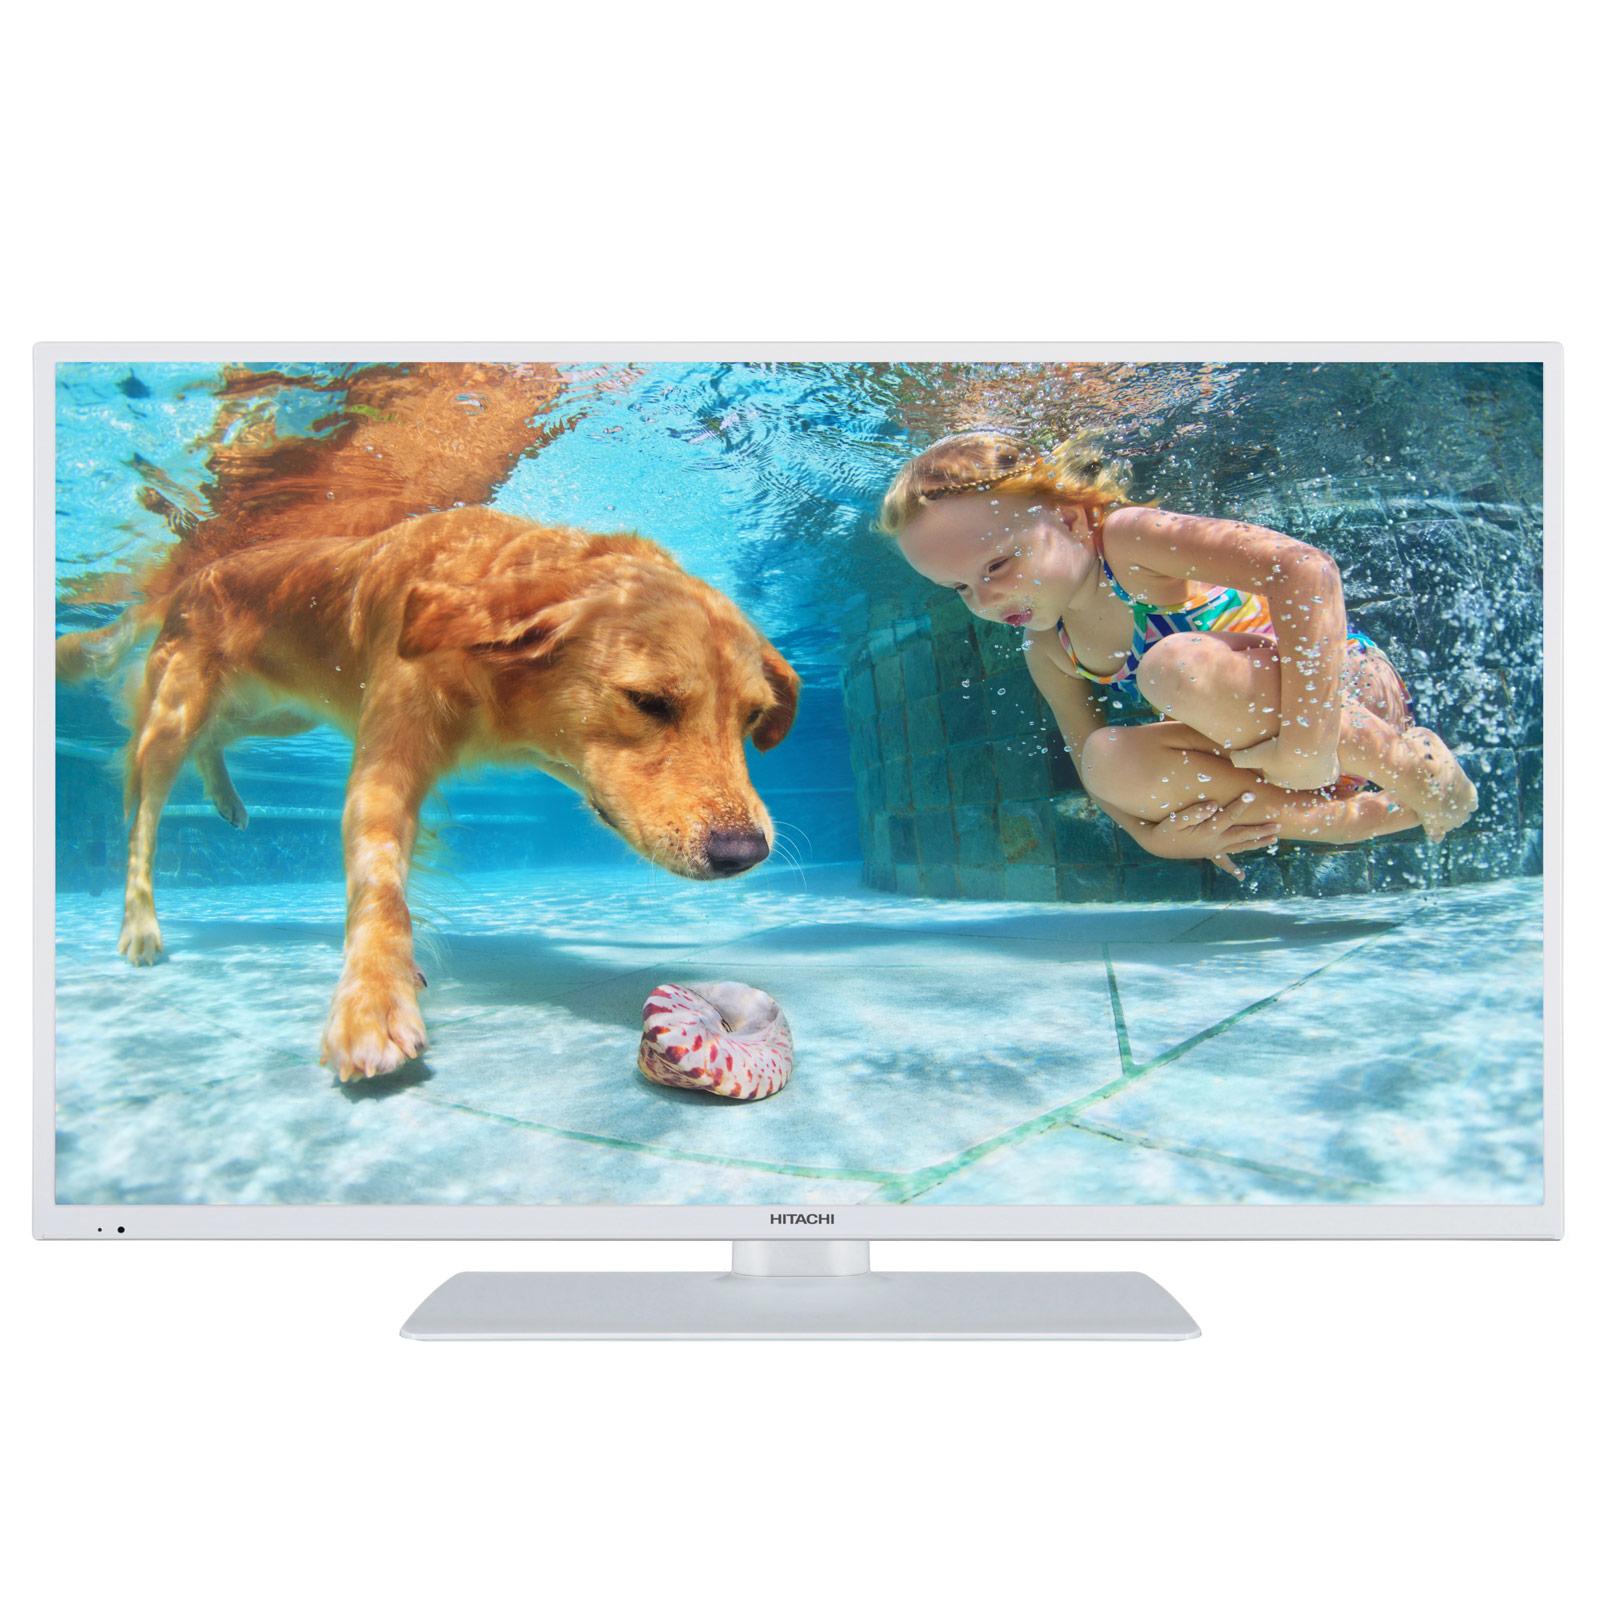 "TV Hitachi 55HK6000 Blanc Téléviseur LED 4K 55"" (140 cm) 16/9 - 3840 x 2160 pixels - HDR - Ultra HD - Wi-Fi - Bluetooth - 1200 Hz"